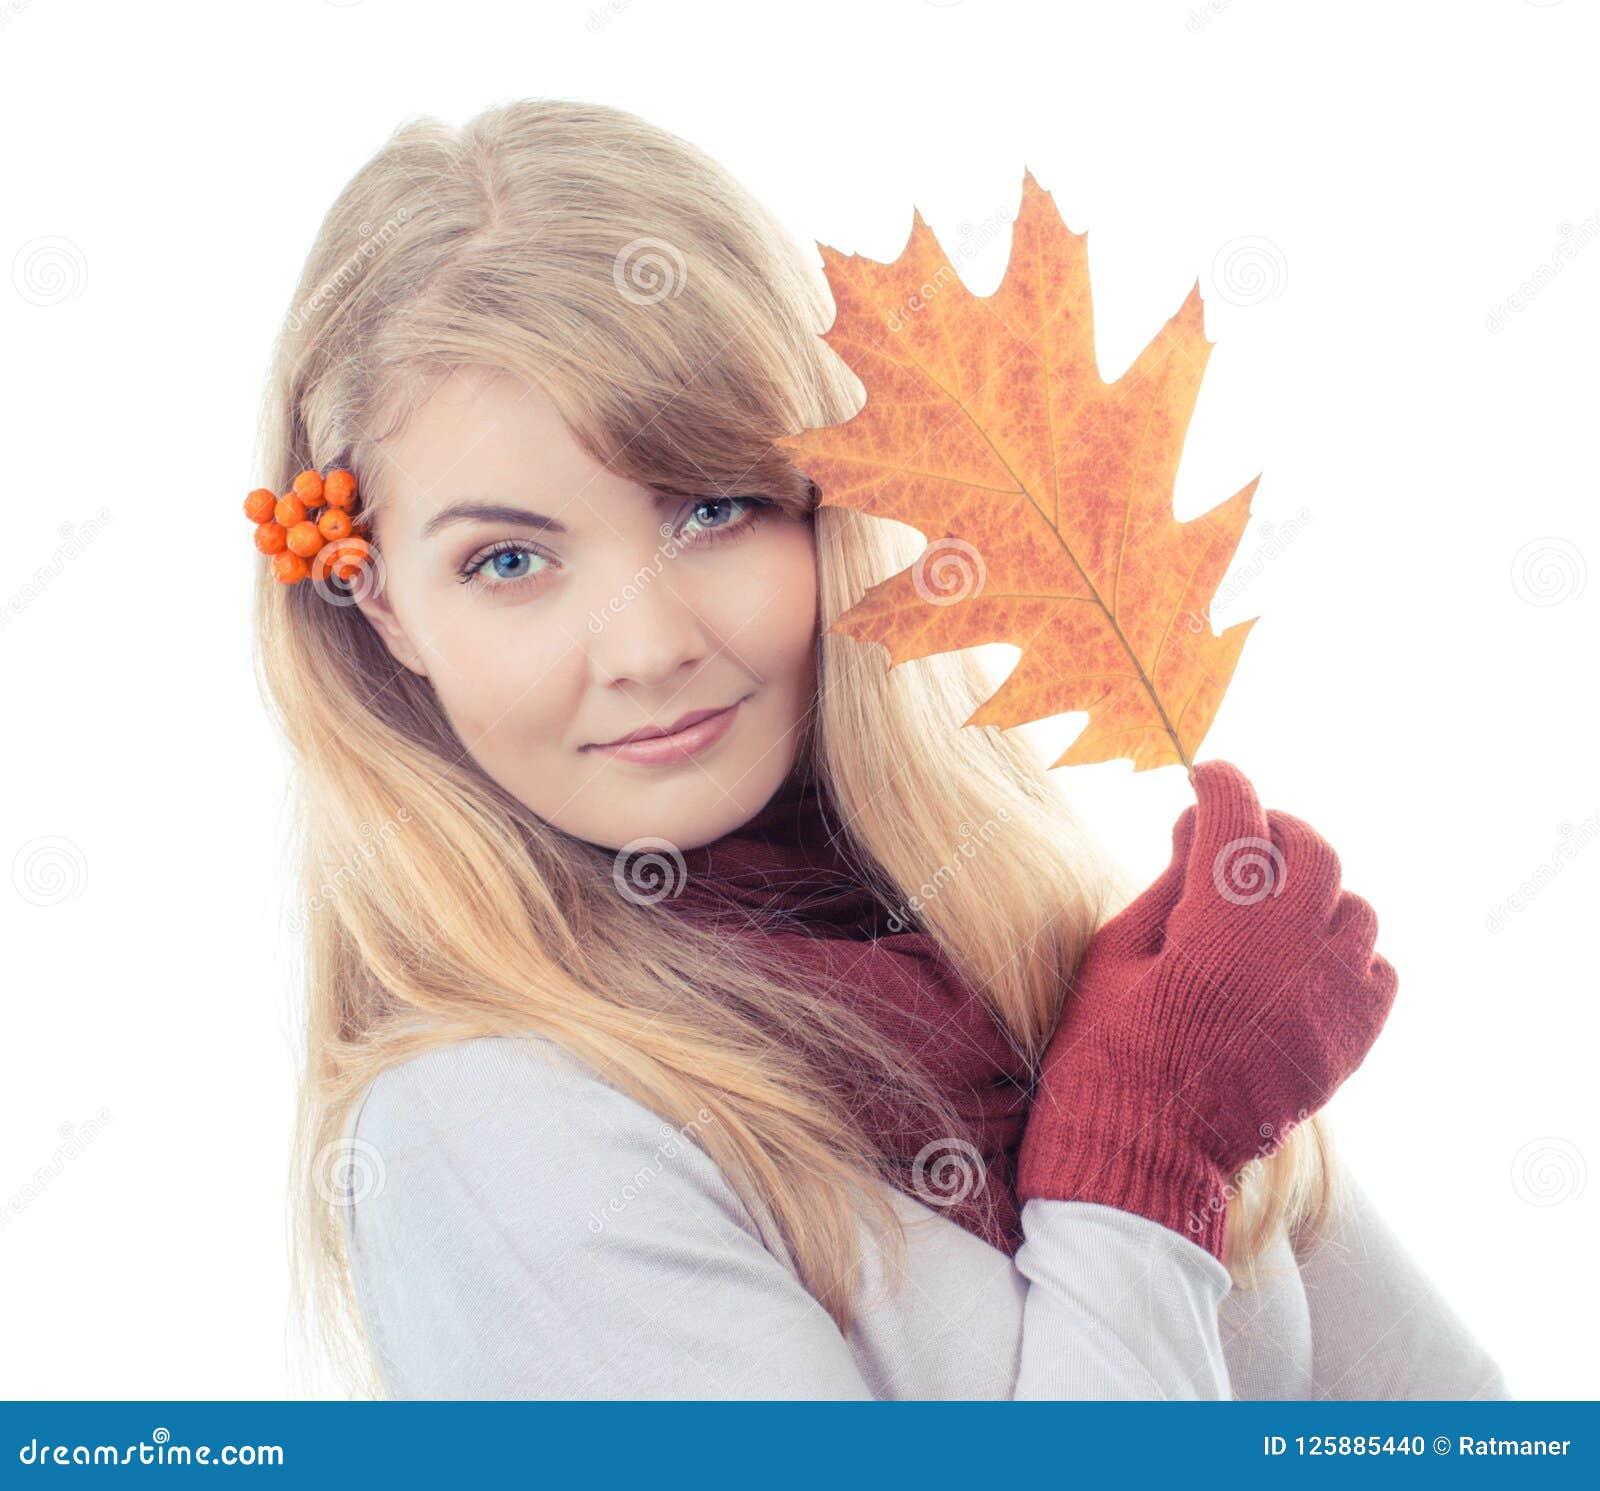 Vintage photo, Happy smiling girl in gloves holding autumnal leaf